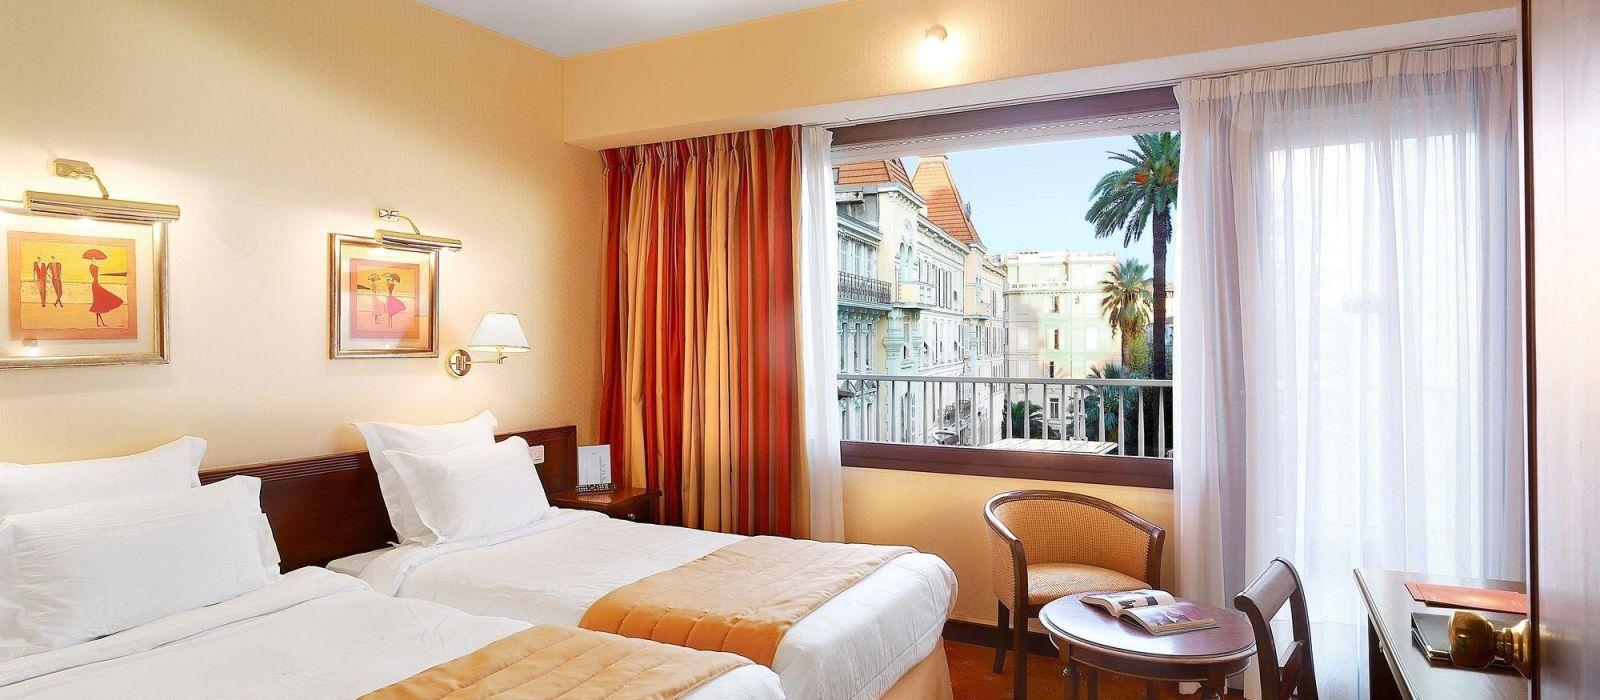 Hotel Splendid  & Spa Nice France